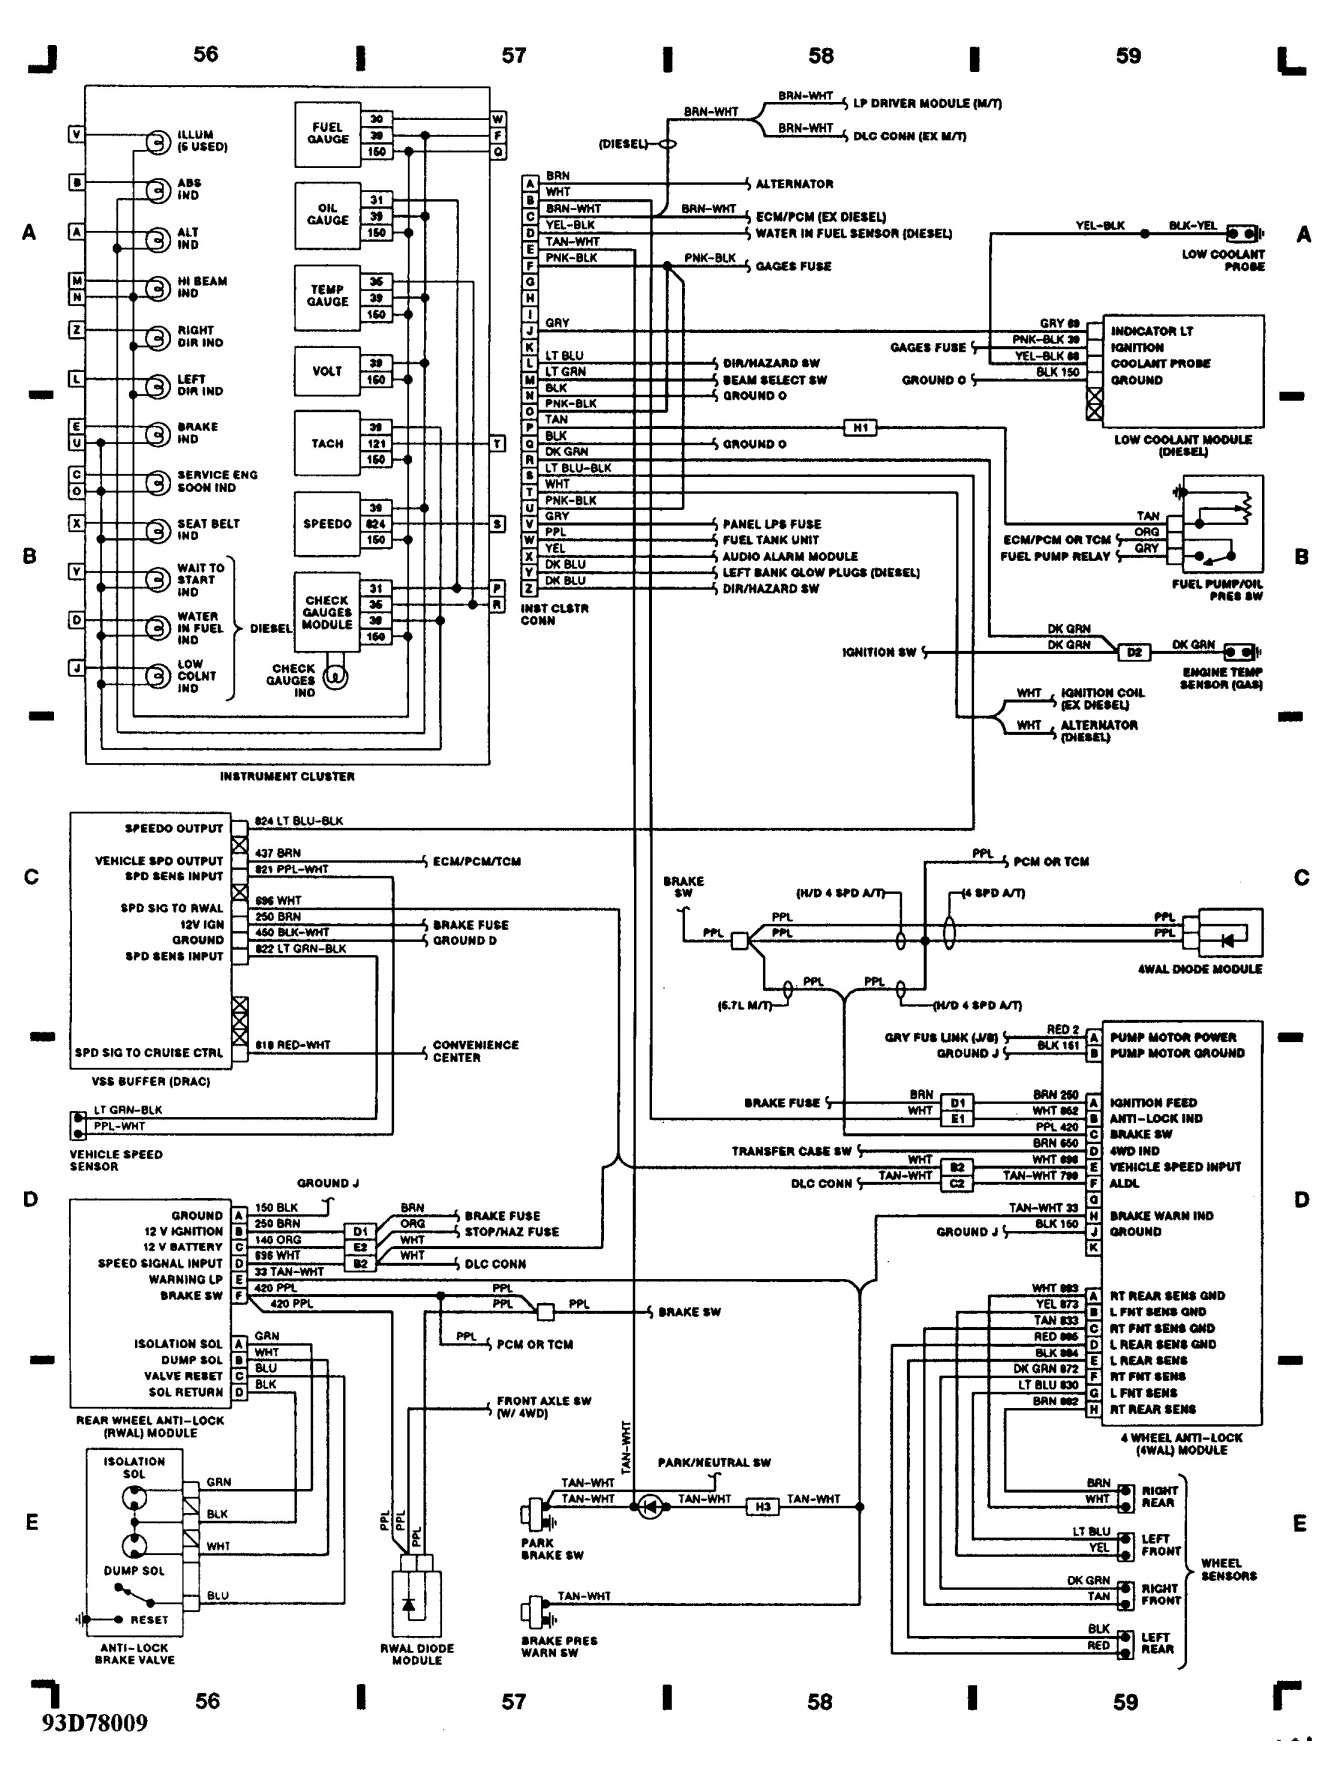 10 Caterpillar 3126 Engine Wiring Diagram Mobil Listrik